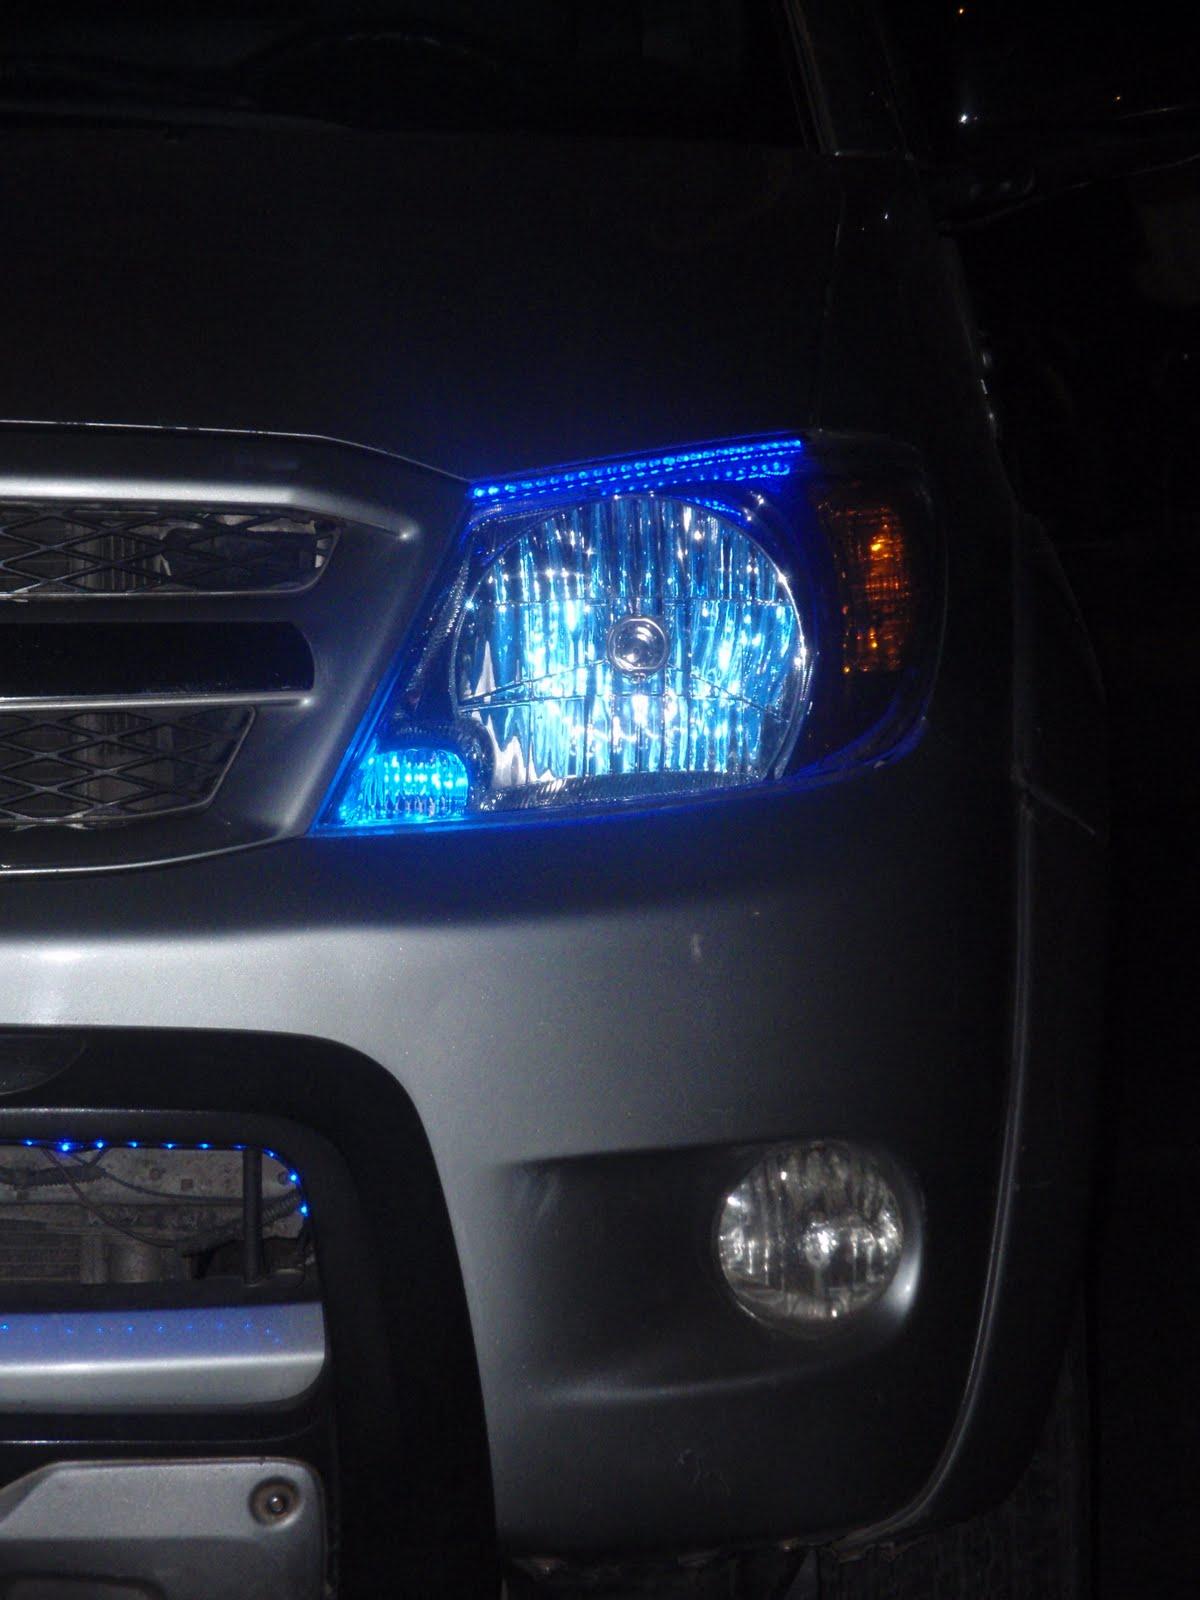 Luces y tiras led para autos y motos tuning iluminacion - Tiras luces led ...